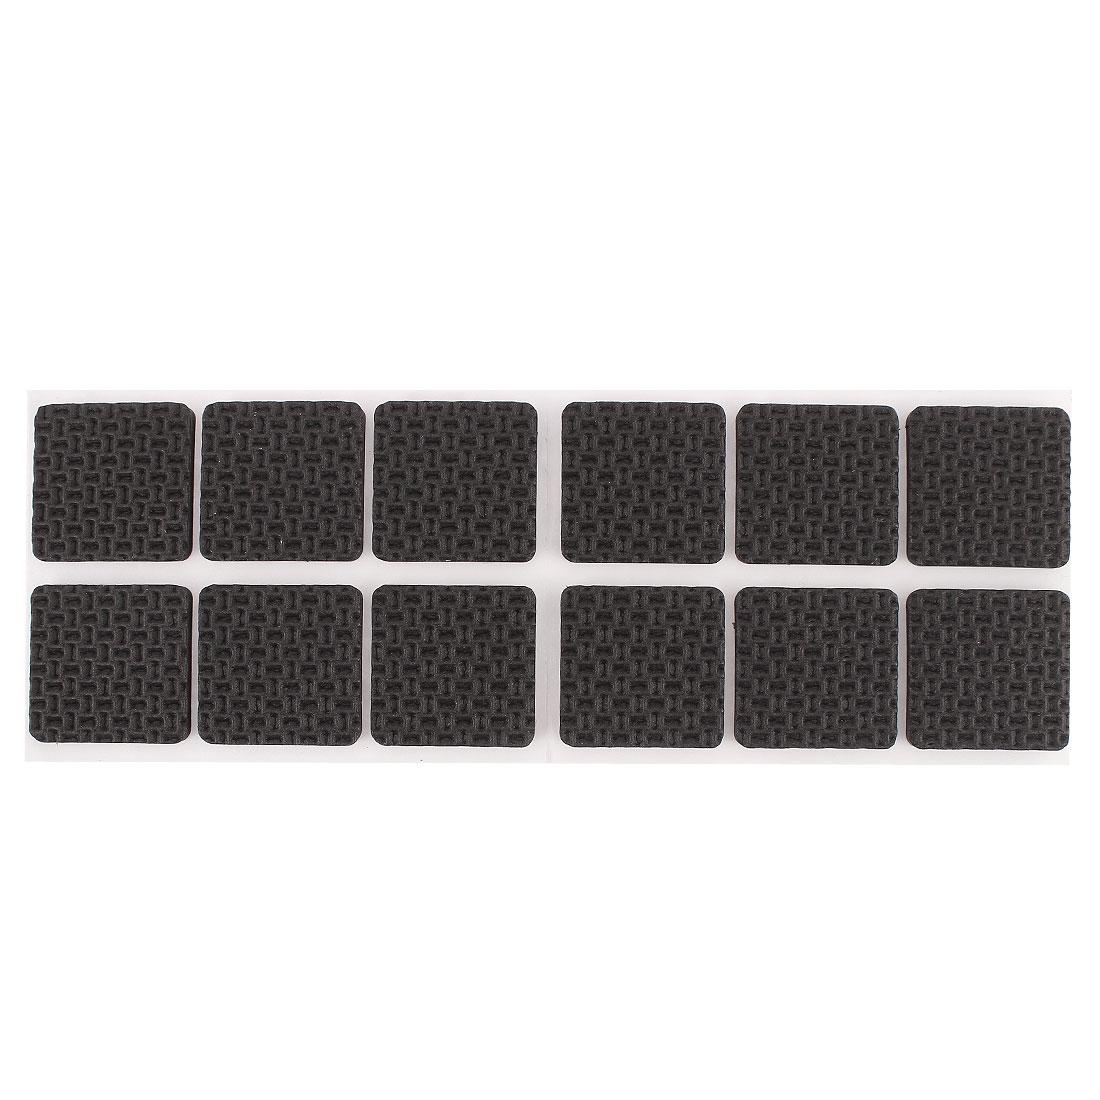 Self-adhesive Square Shape Furniture Protection Cushion Pads Mat 12pcs